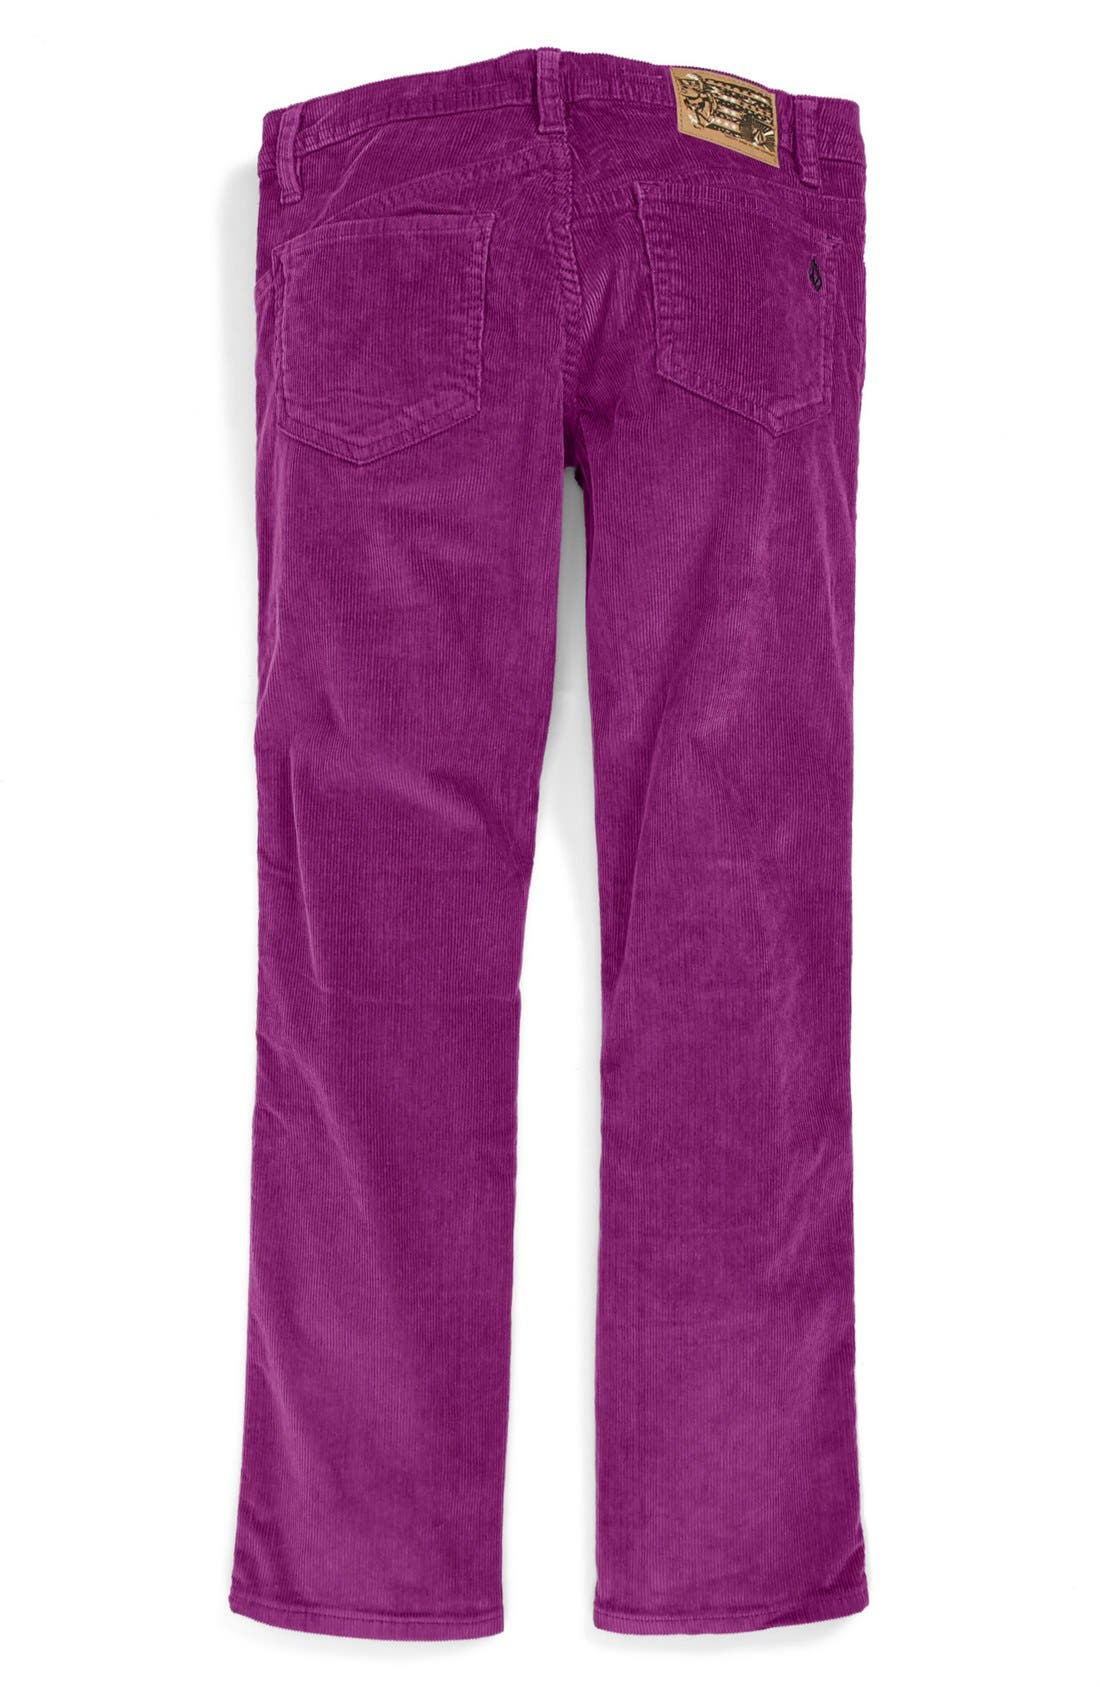 Alternate Image 2  - Volcom '2X4' Corduroy Pants (Big Boys)